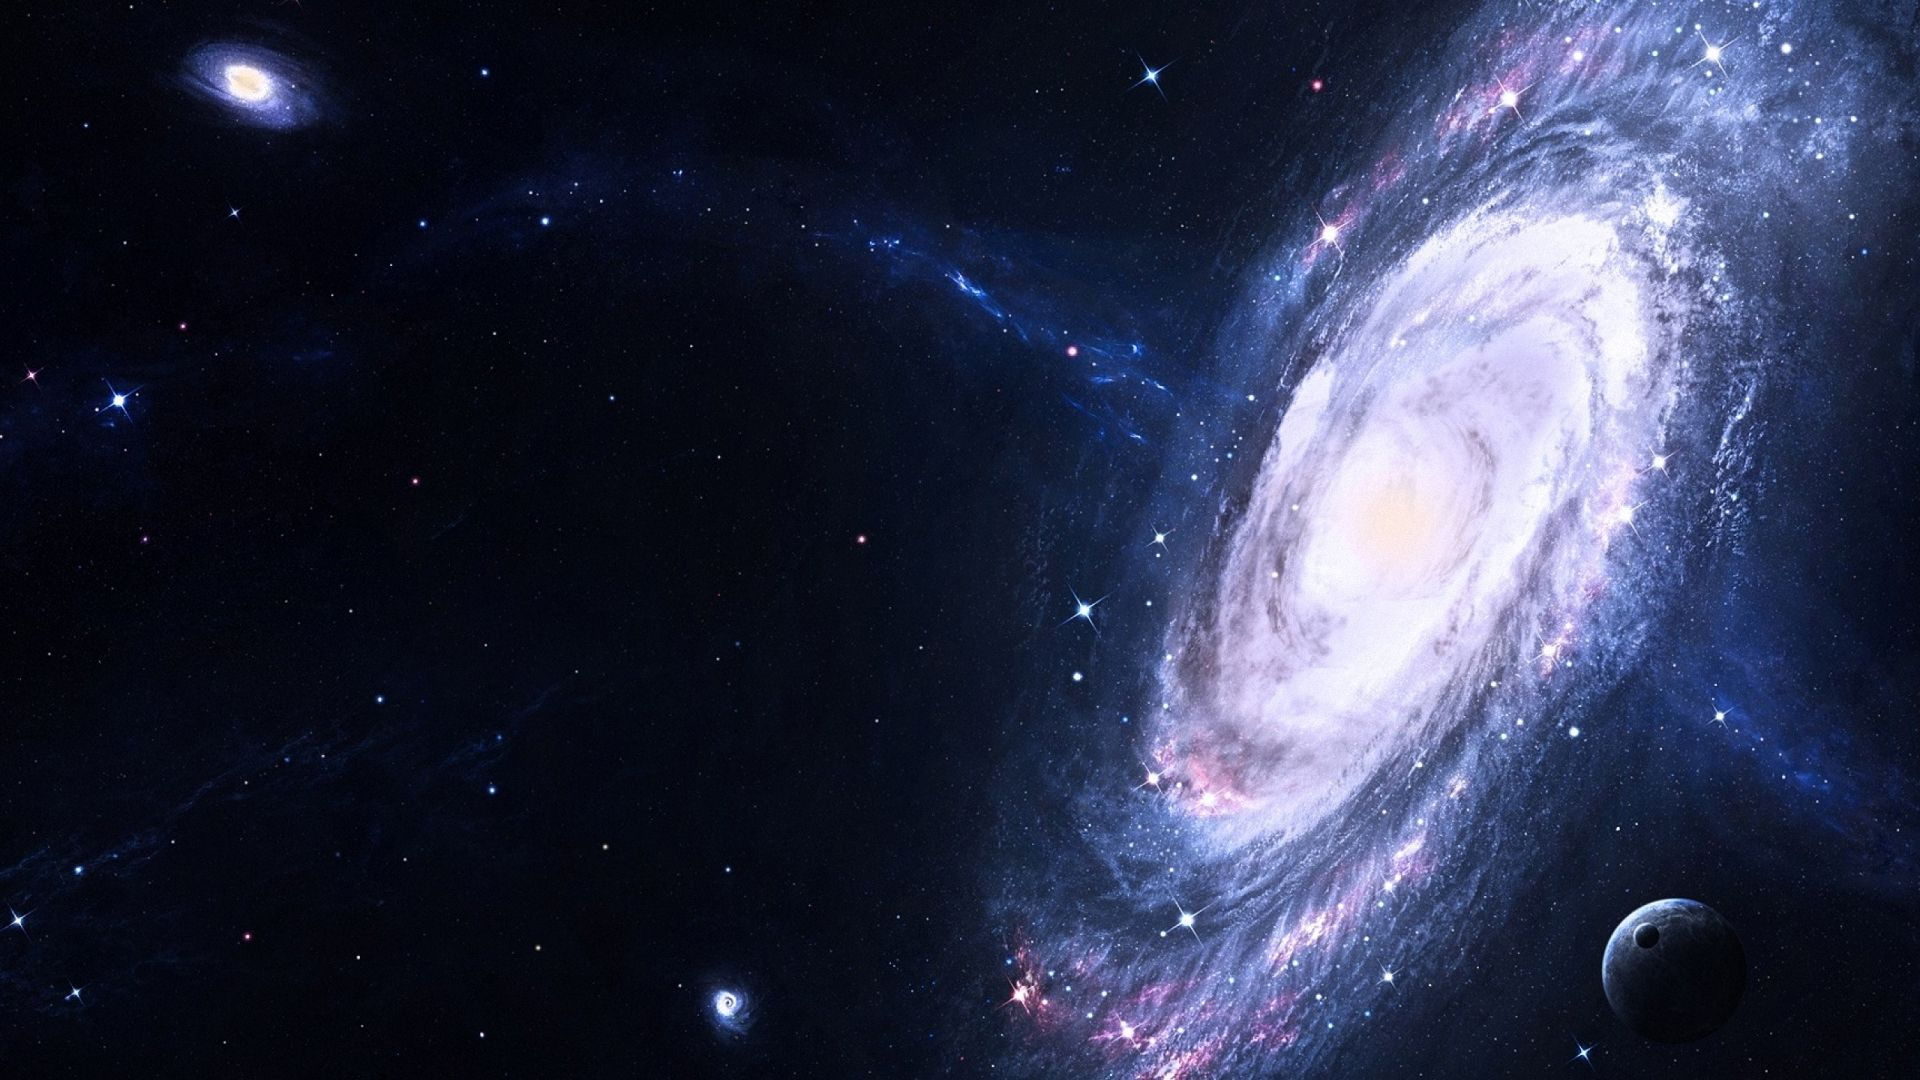 1920x1080 space star galaxy wallpapers full HD